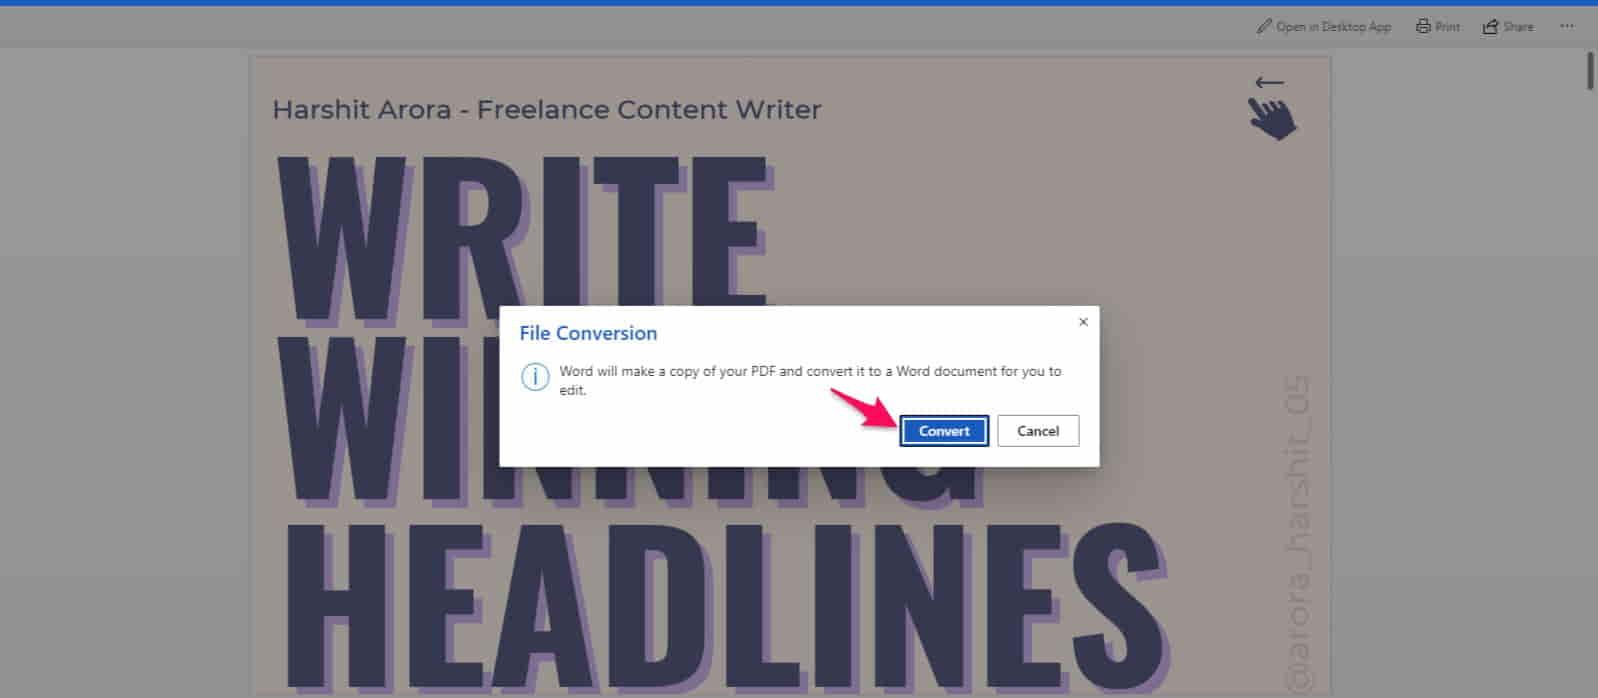 how to edit PDF file, how to edit PDF, how to edit a PDF document, how to edit PDF files online, how to edit PDF file in word